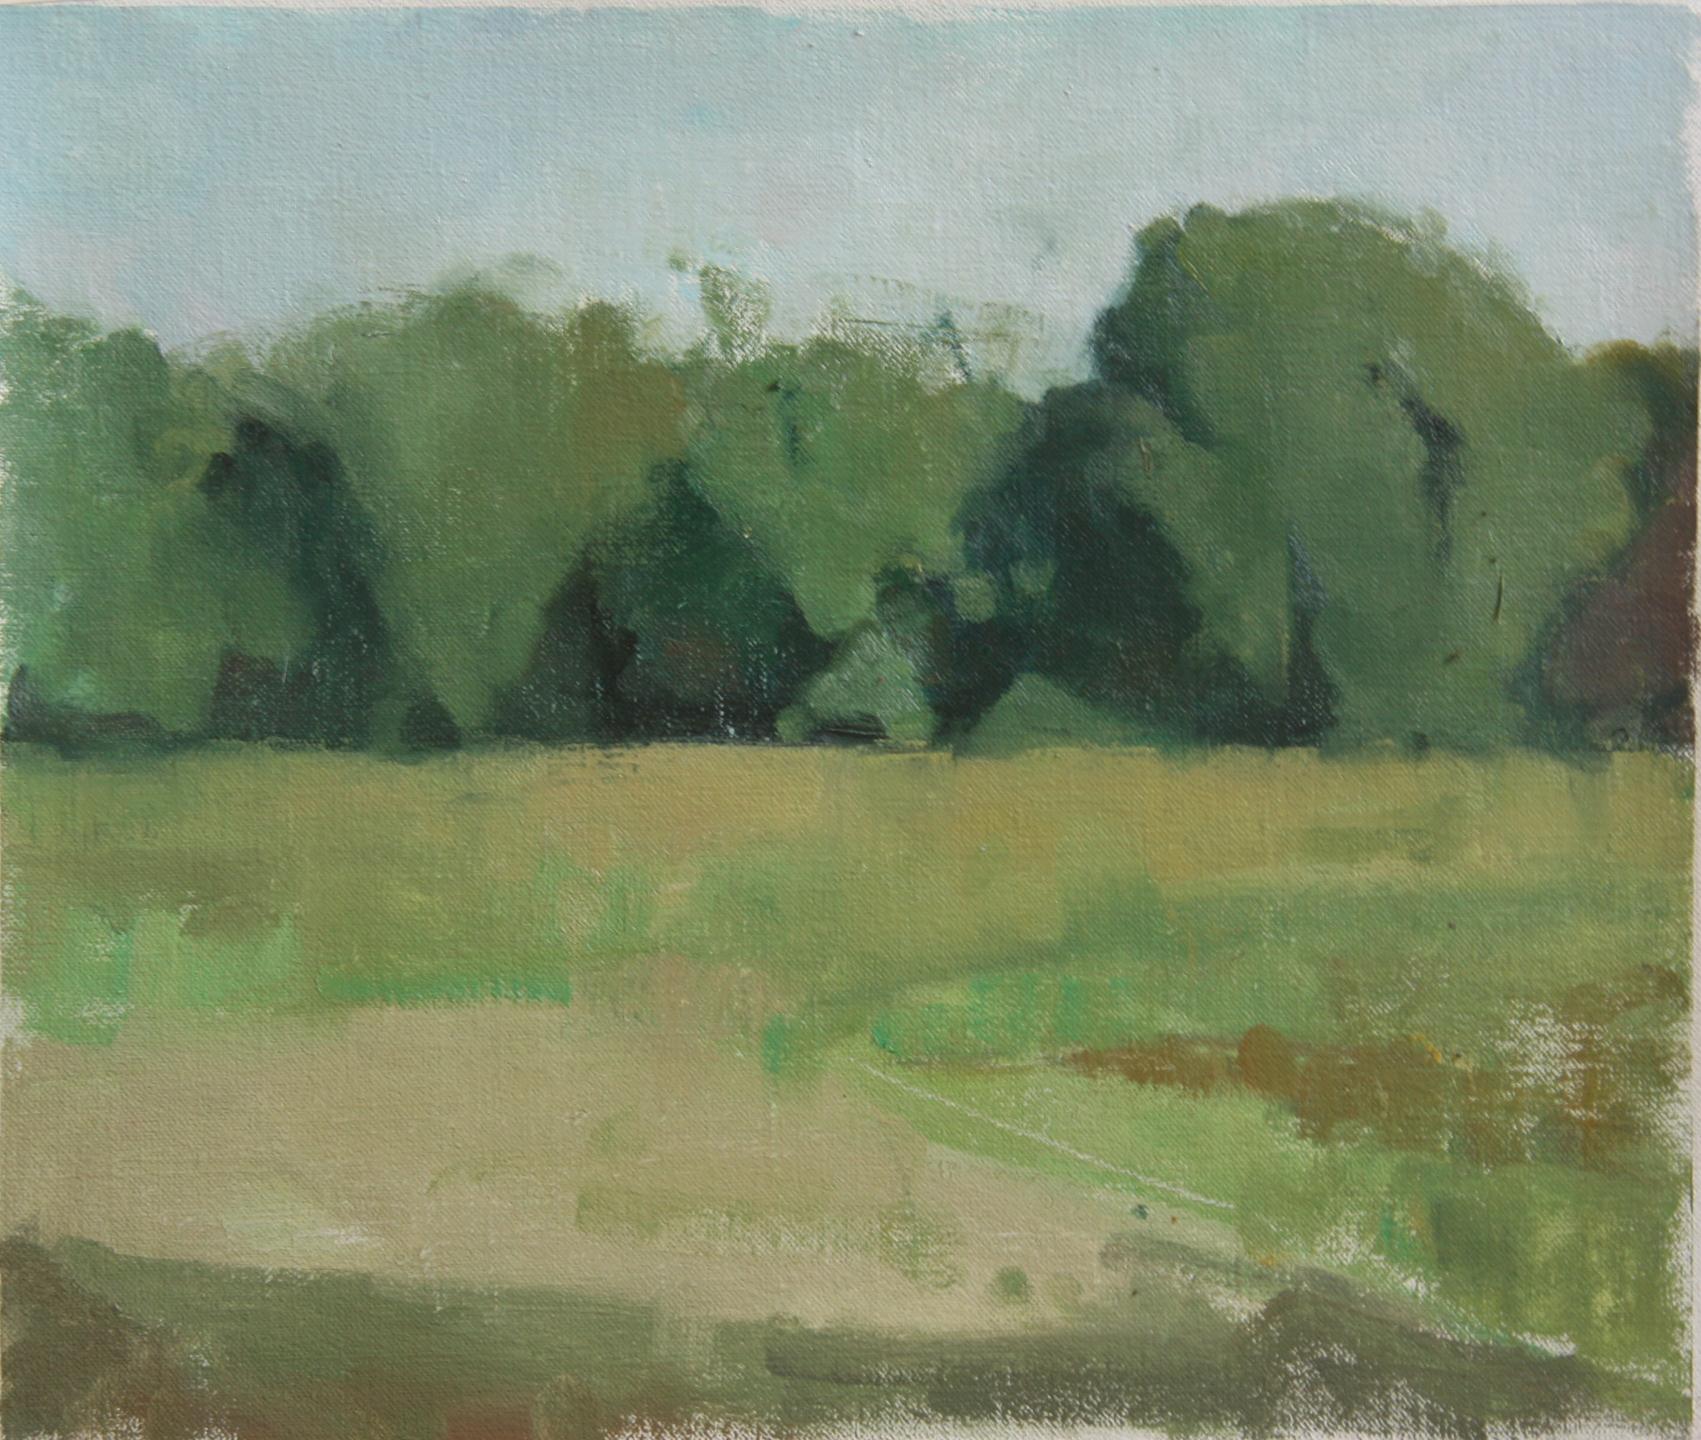 Untitled (Bel Air), 2016, Oil on Linen, 35.5 x 30 cm